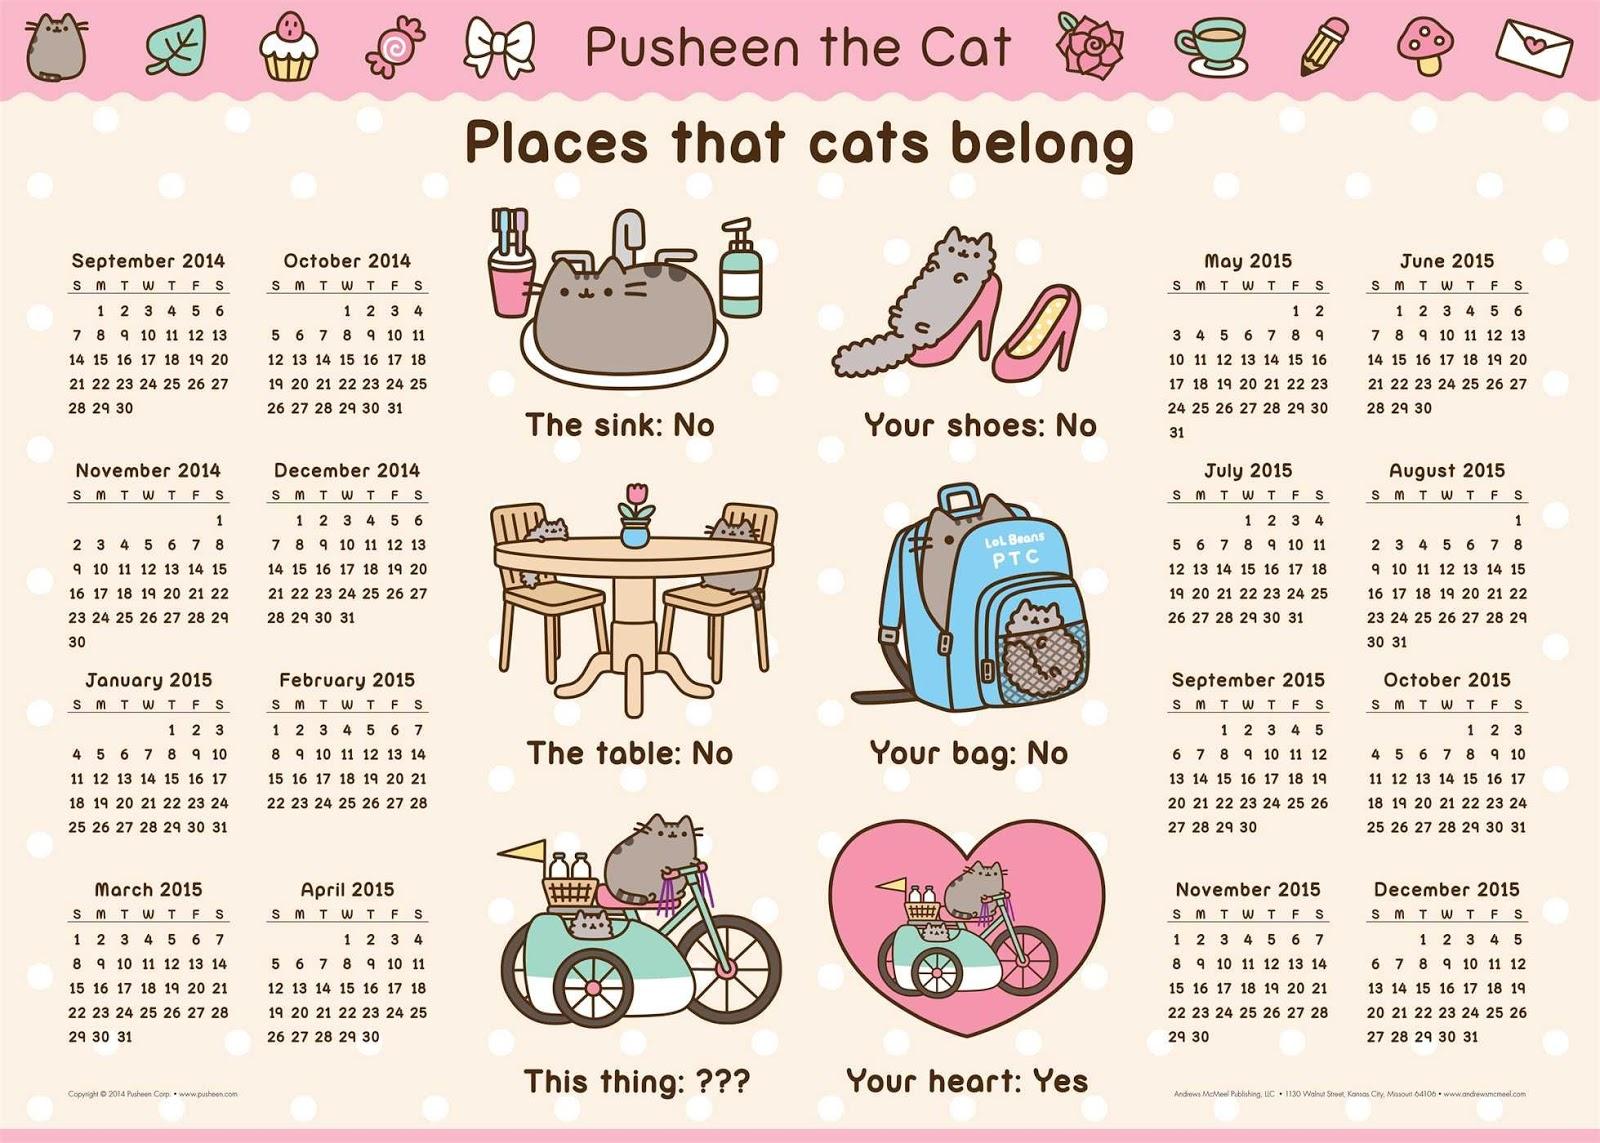 Pusheen Large Pusheen Plush Toy And I Am The Cat